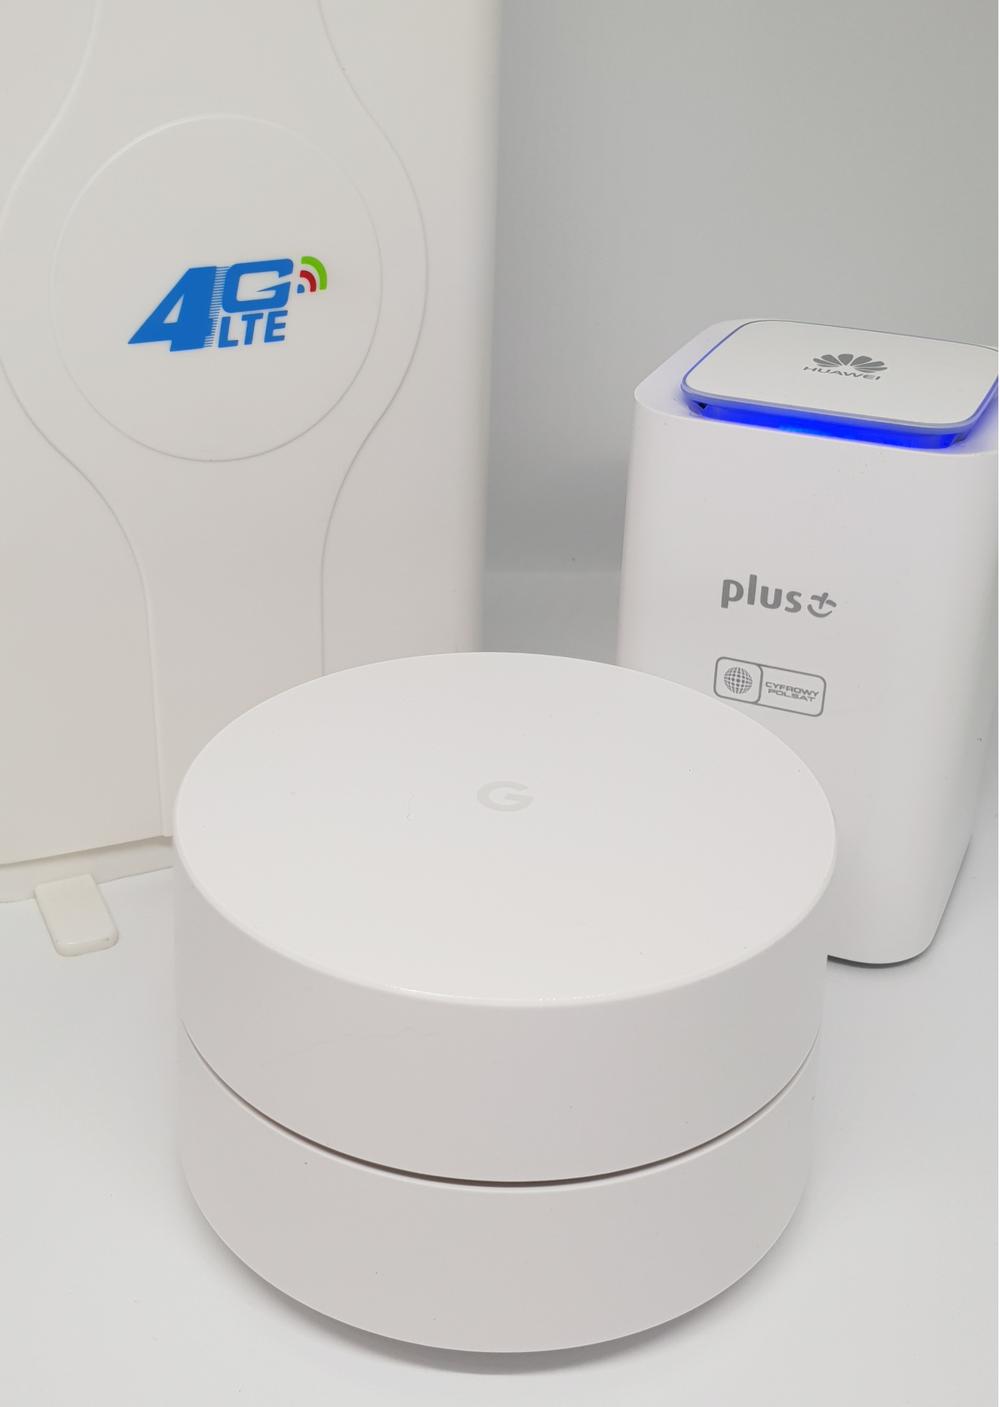 fast internet 4g modem router wifi